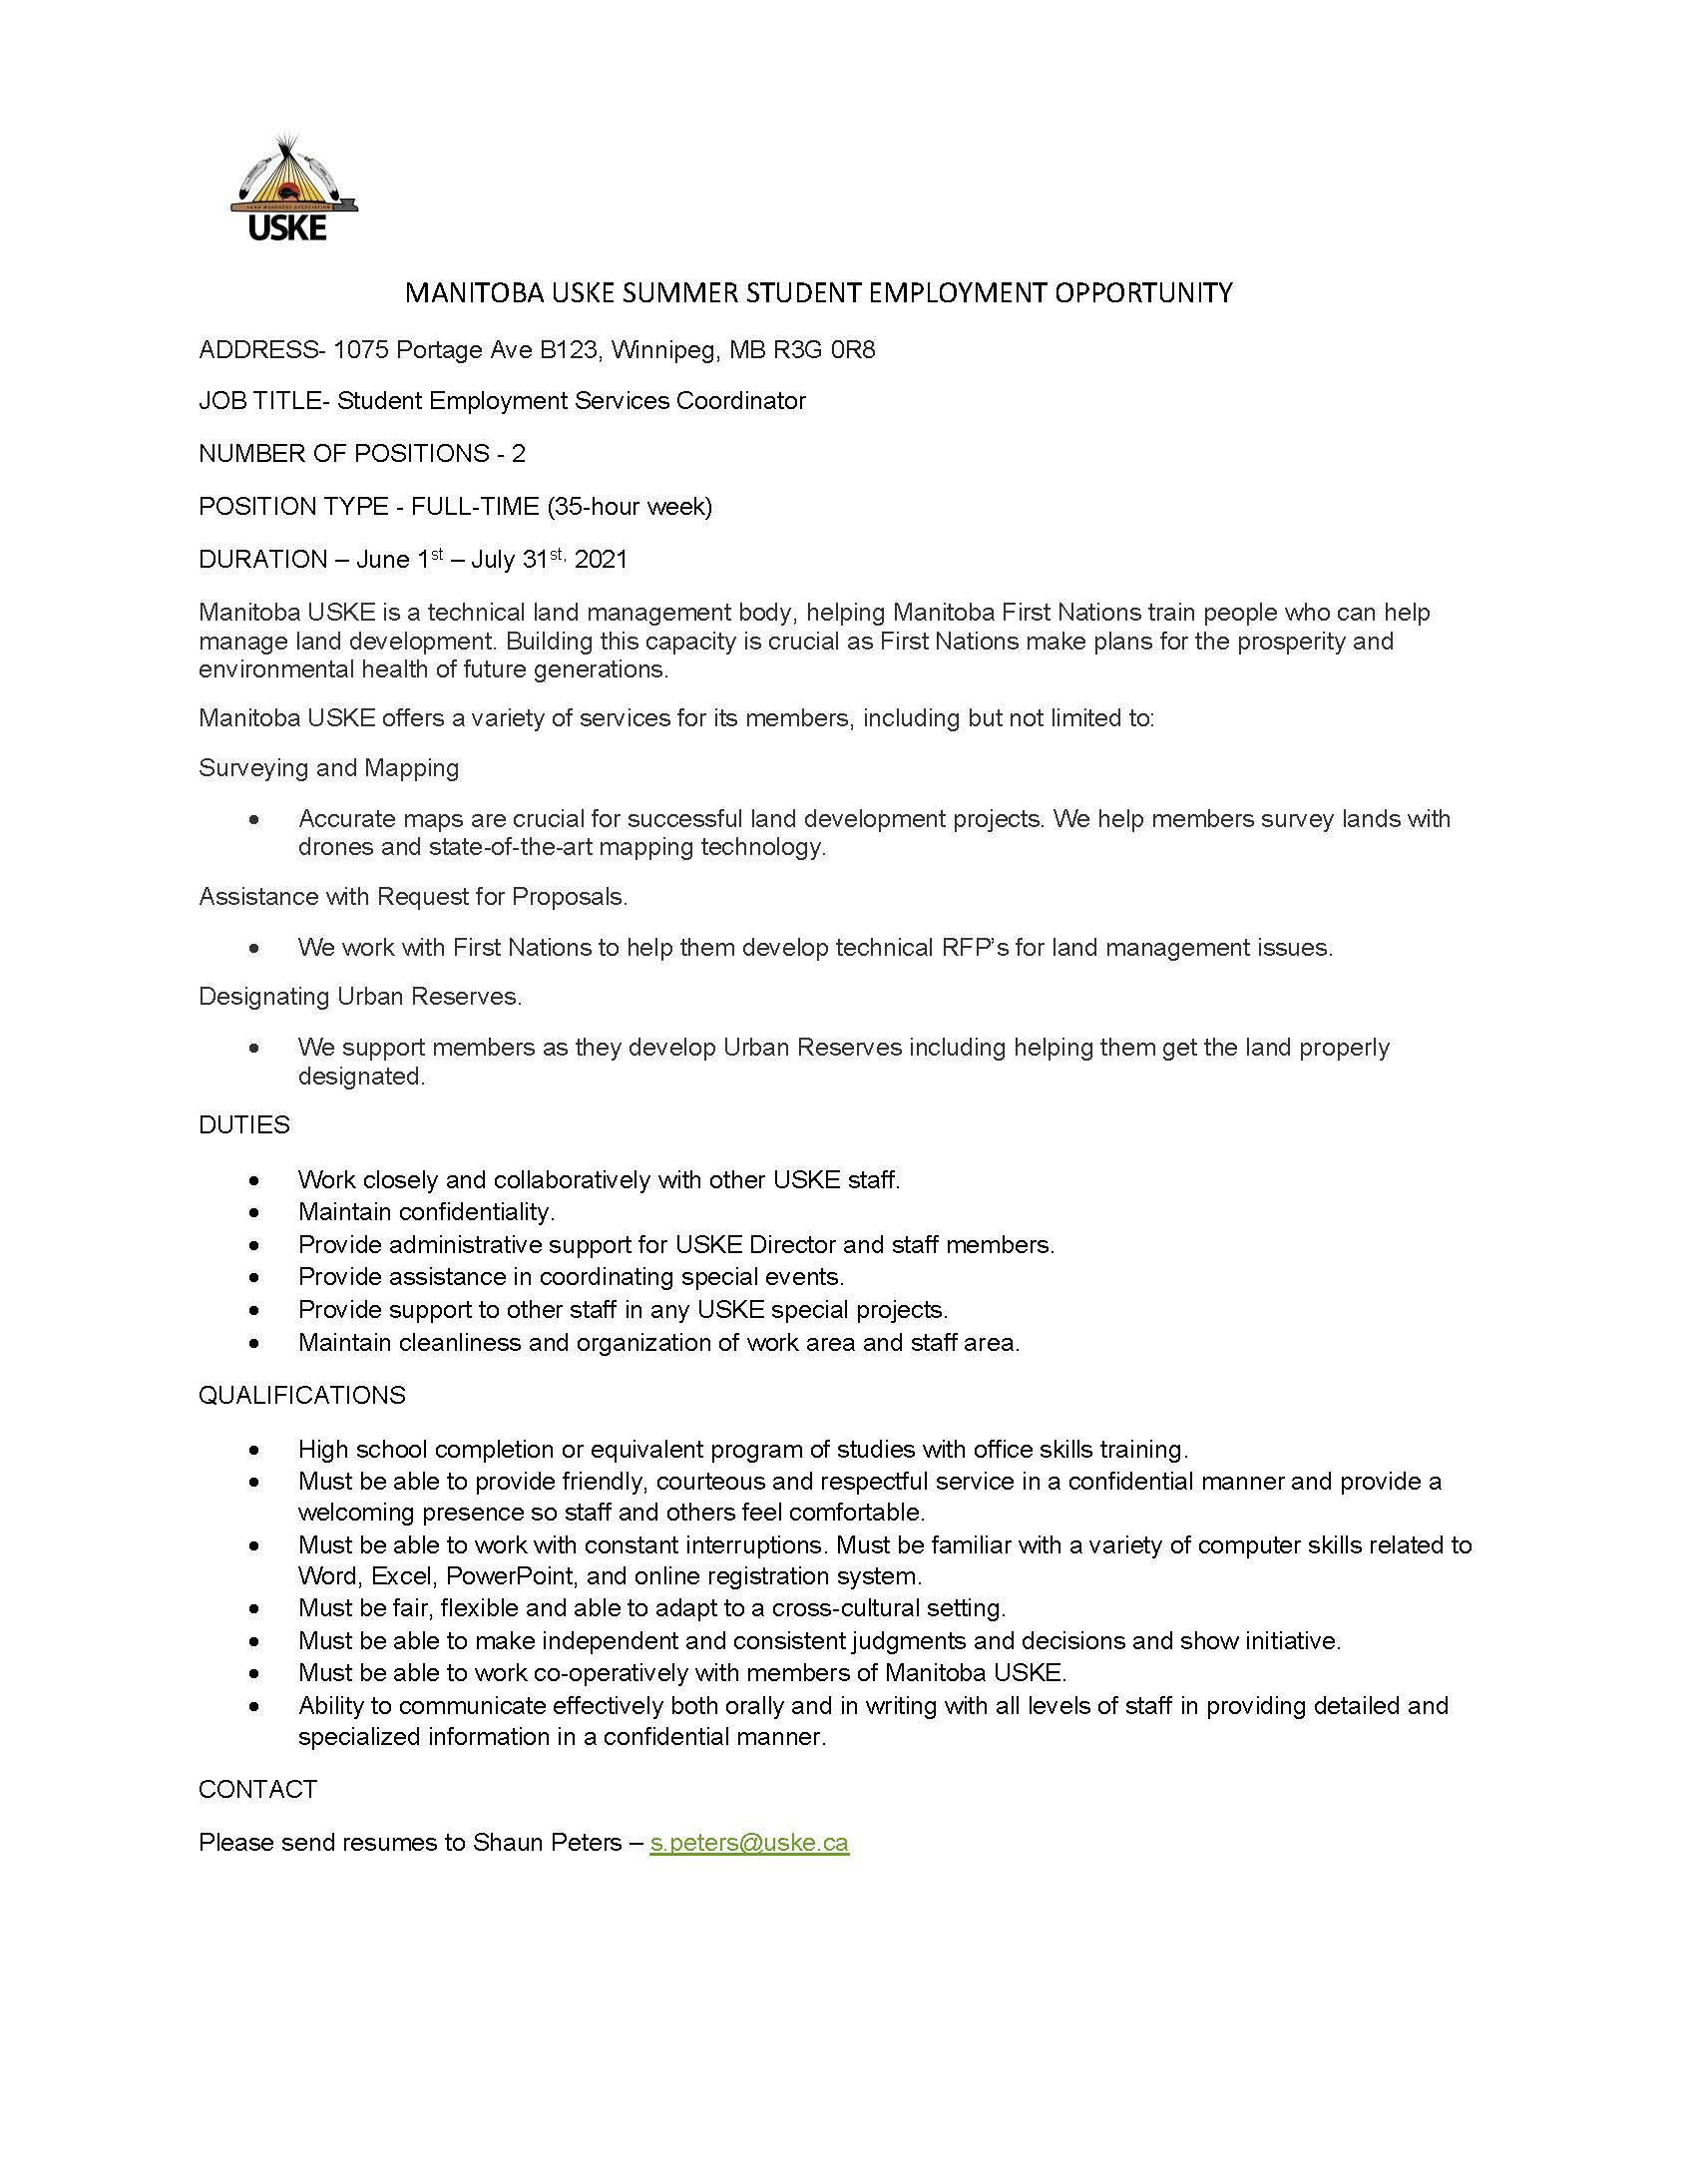 Job description - download using link below